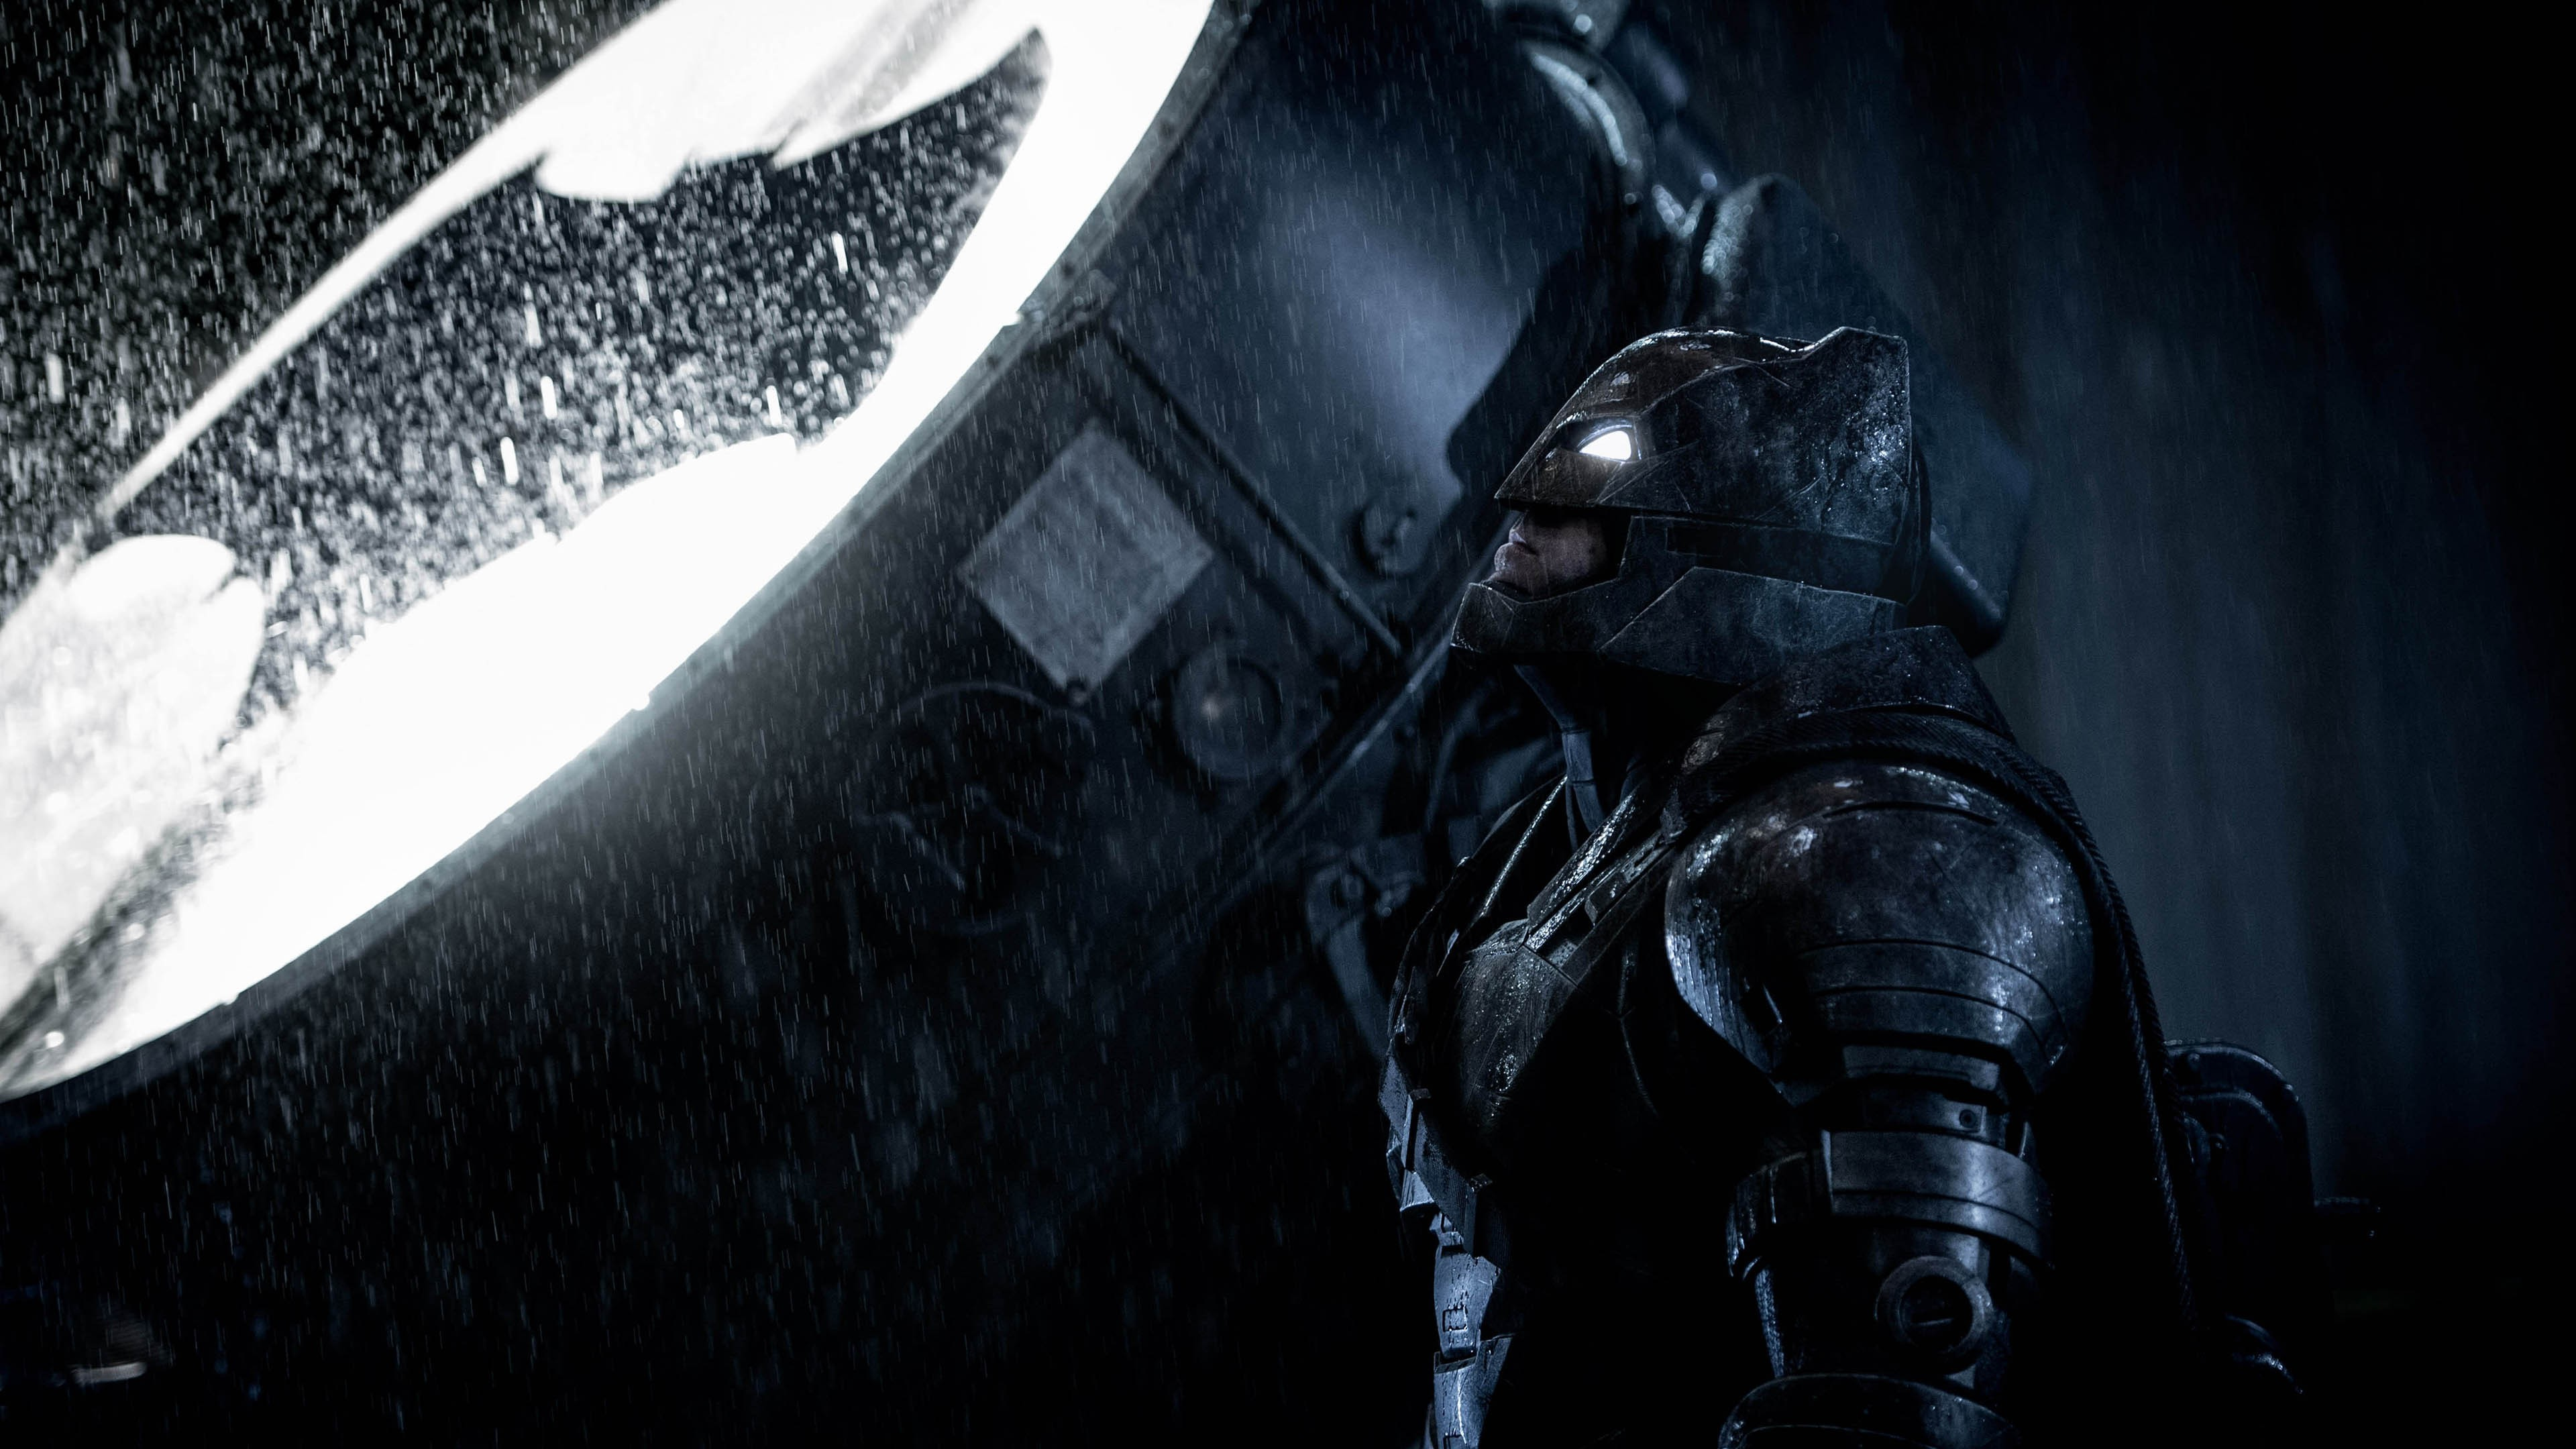 Batman V Superman: Dawn Of Justice, Batman, Superman, Gotham City,  Metropolis Wallpapers HD / Desktop and Mobile Backgrounds